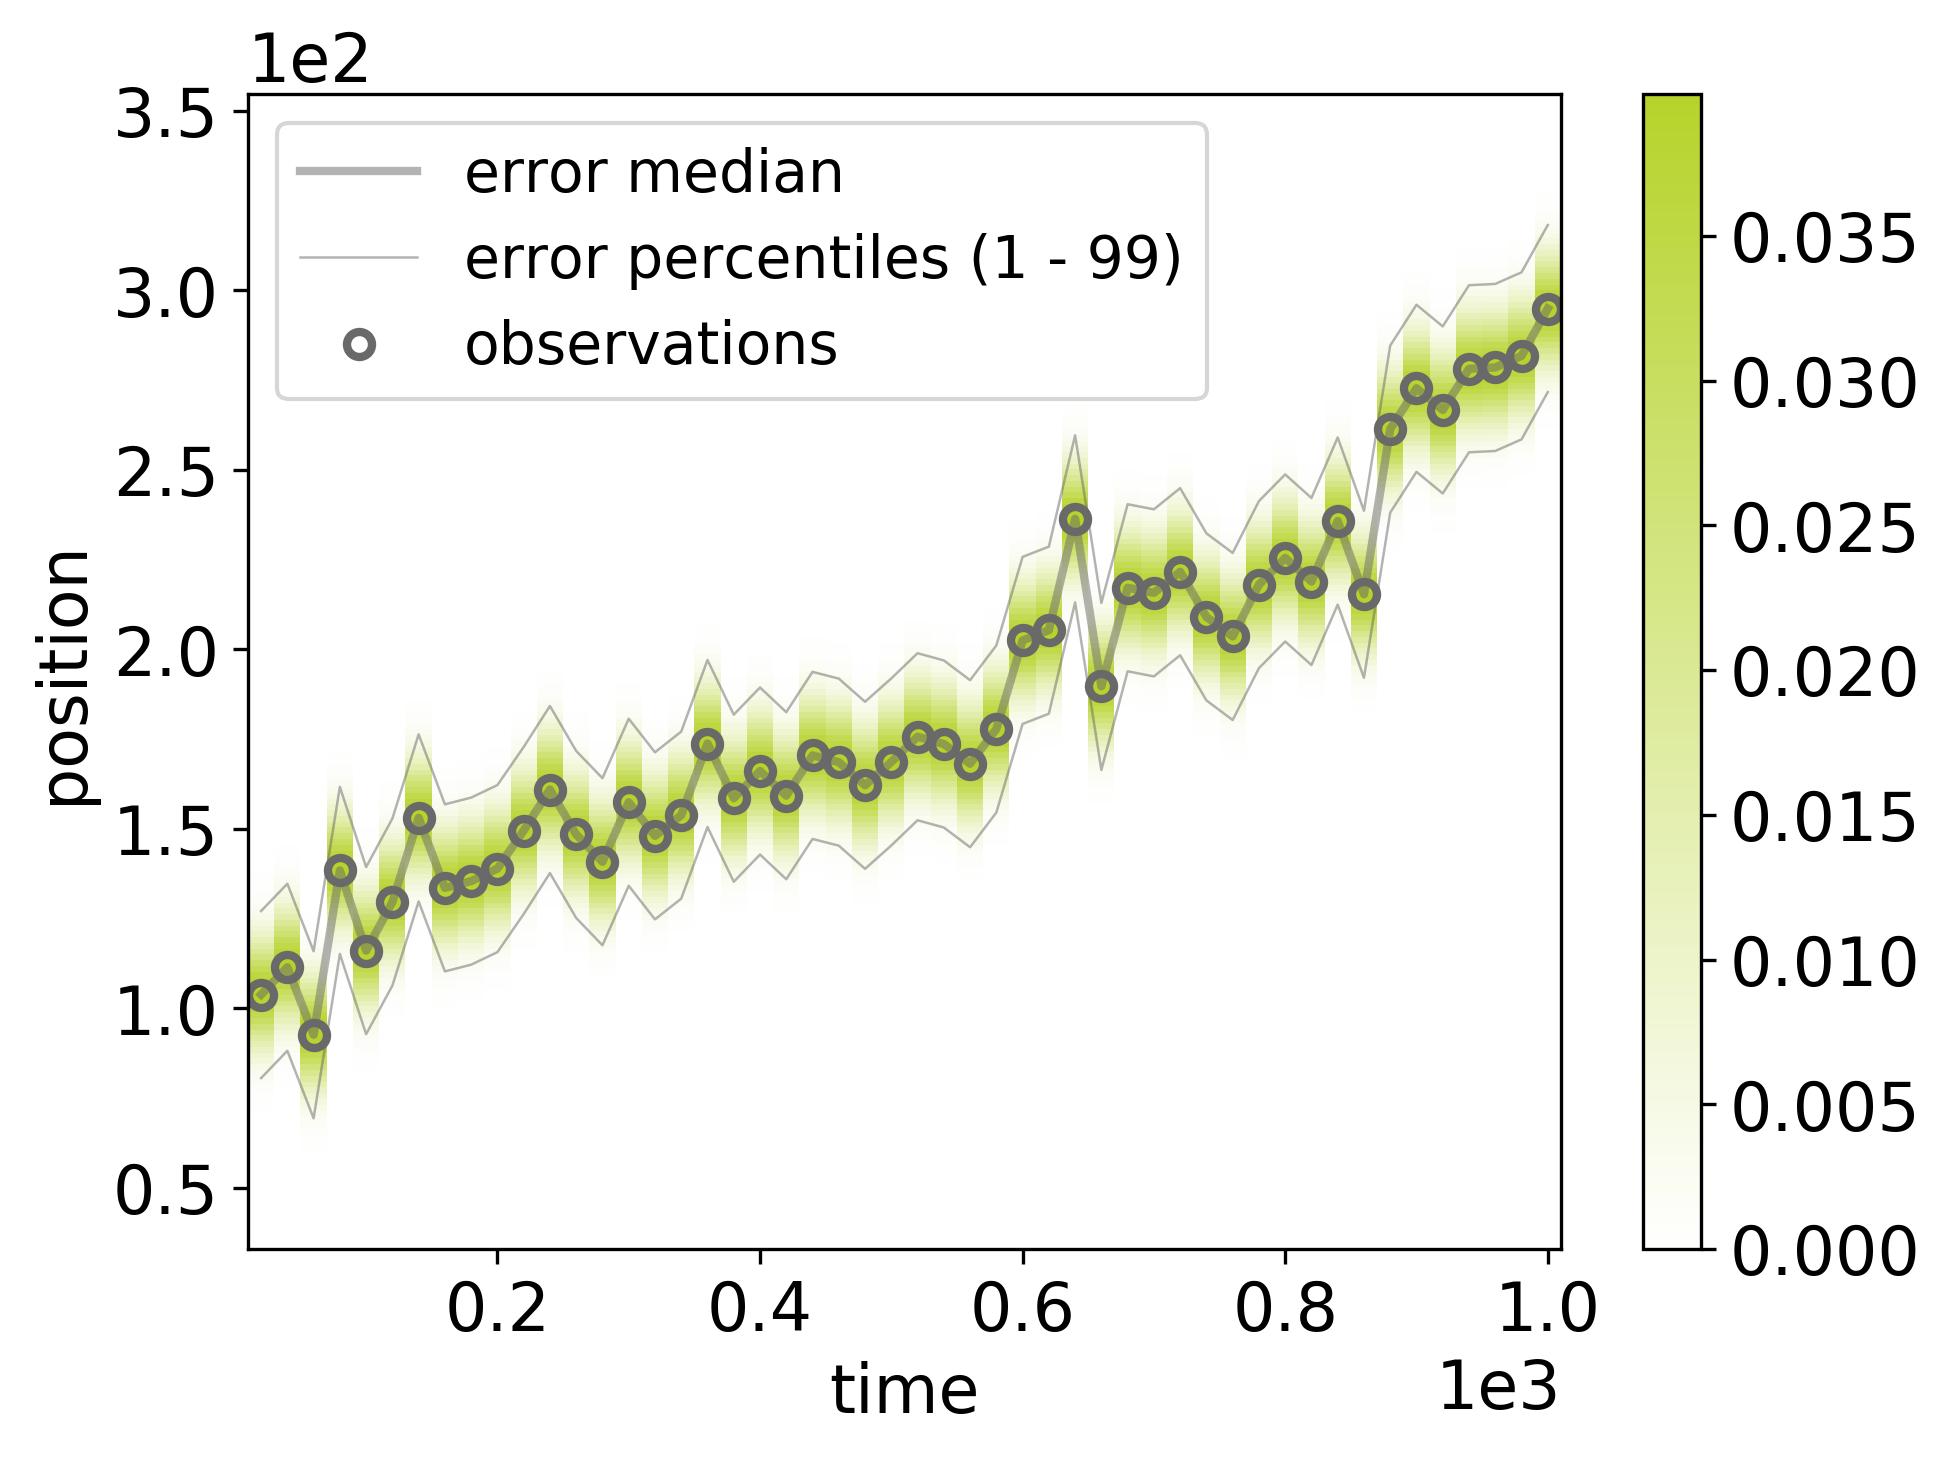 docs/_static/randomwalk/randomwalk_errors-dataset-0.png